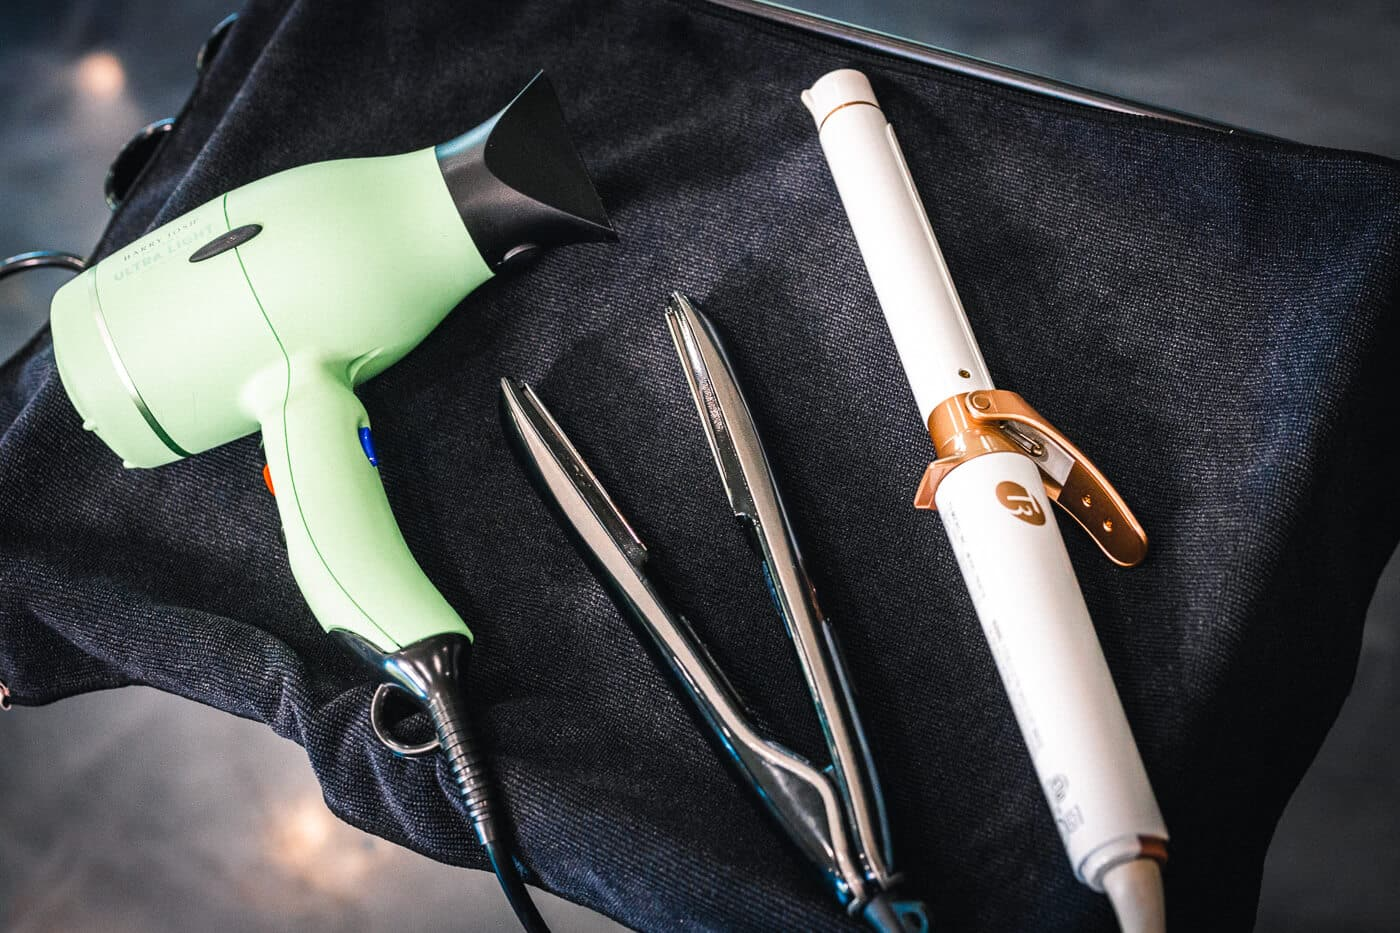 Heatless texture styling tools